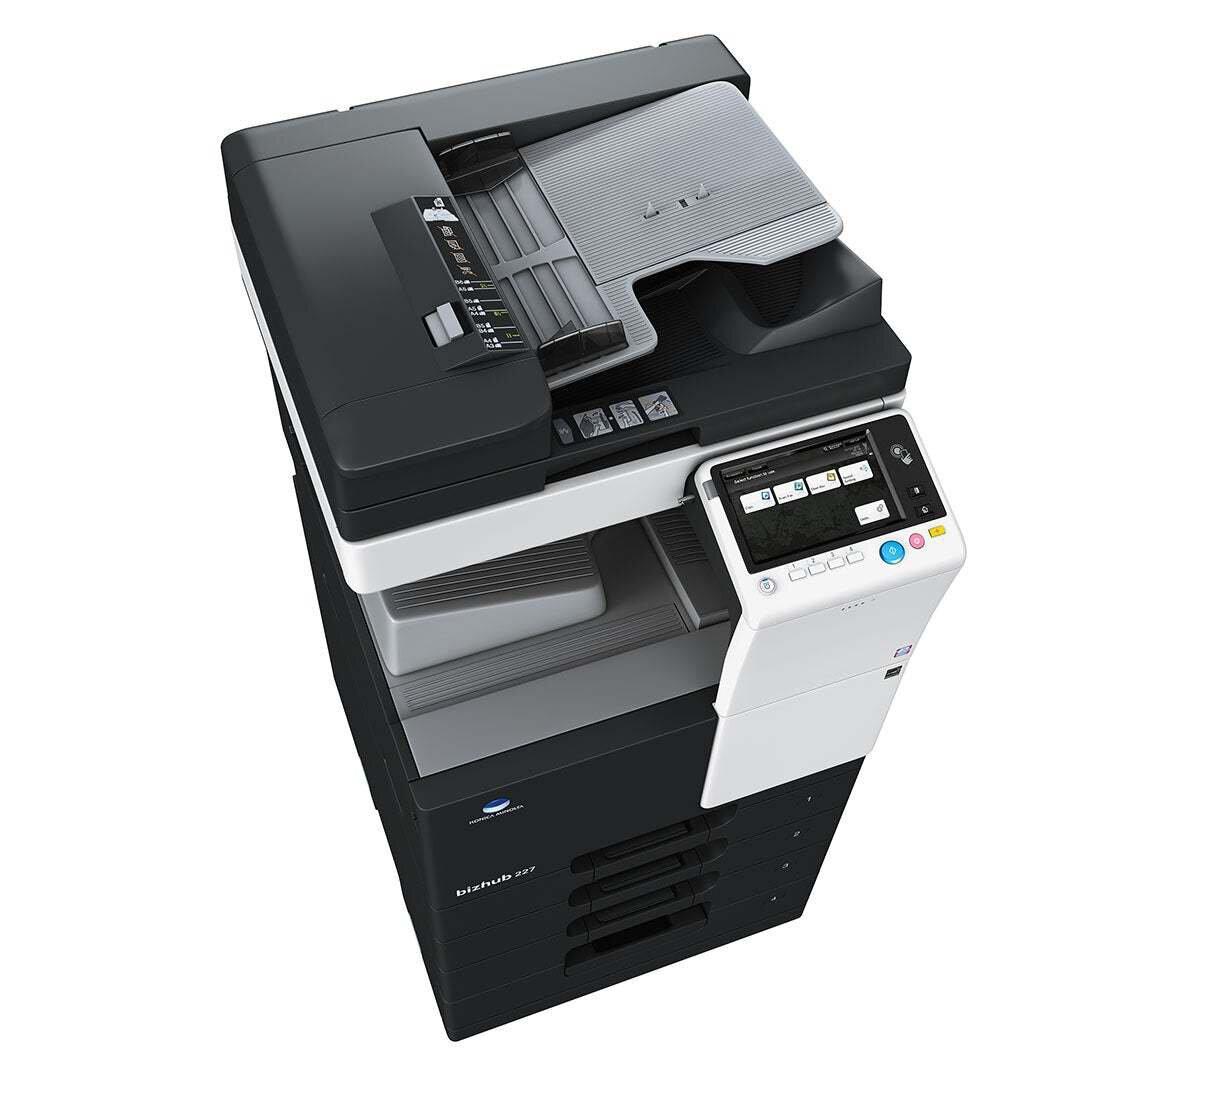 Konica Minolta bizhub 227 office printer